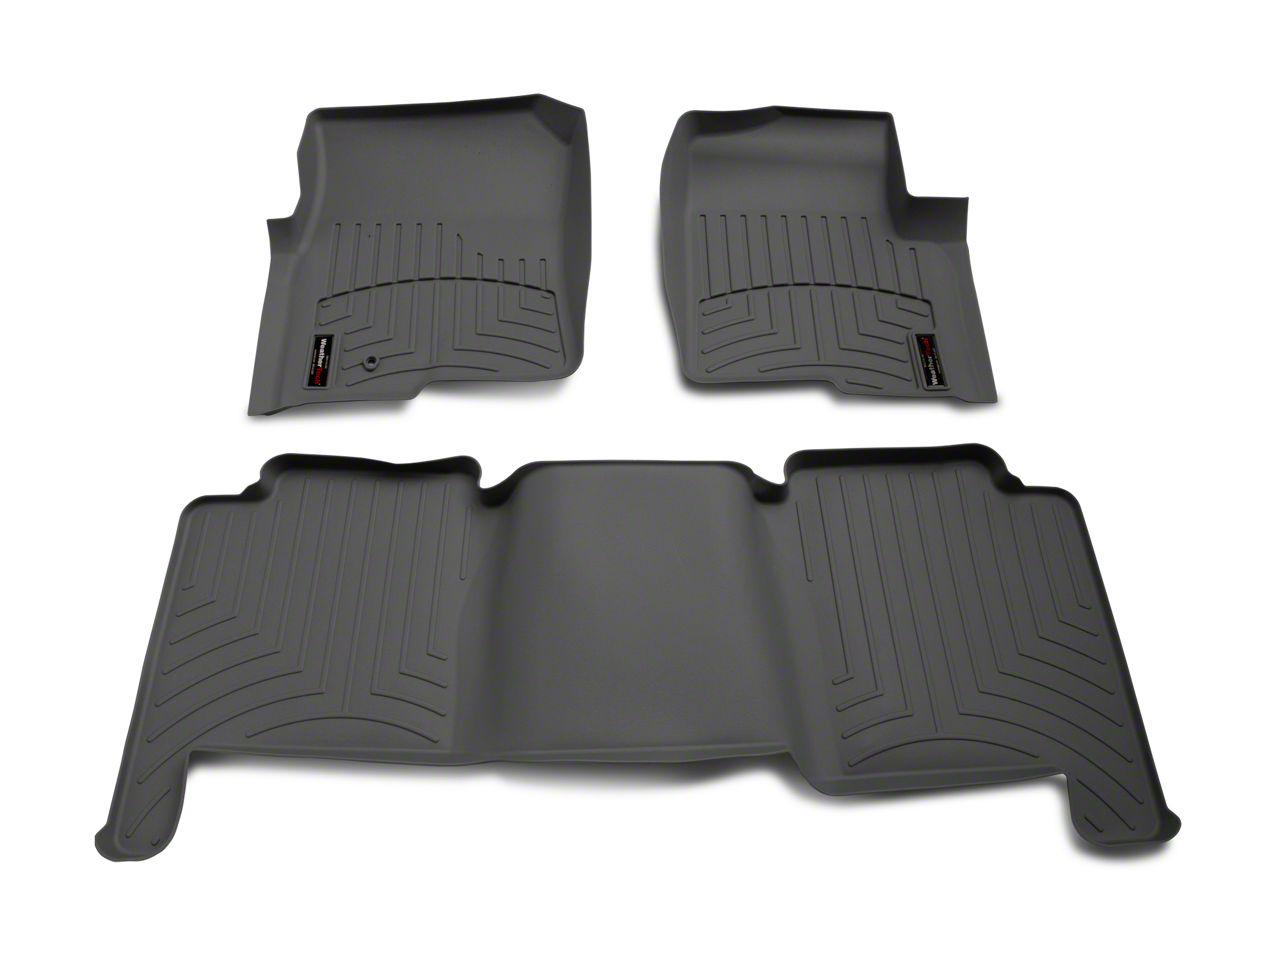 Weathertech DigitalFit Front & Rear Floor Liners - Gray (04-08 F-150 SuperCrew)